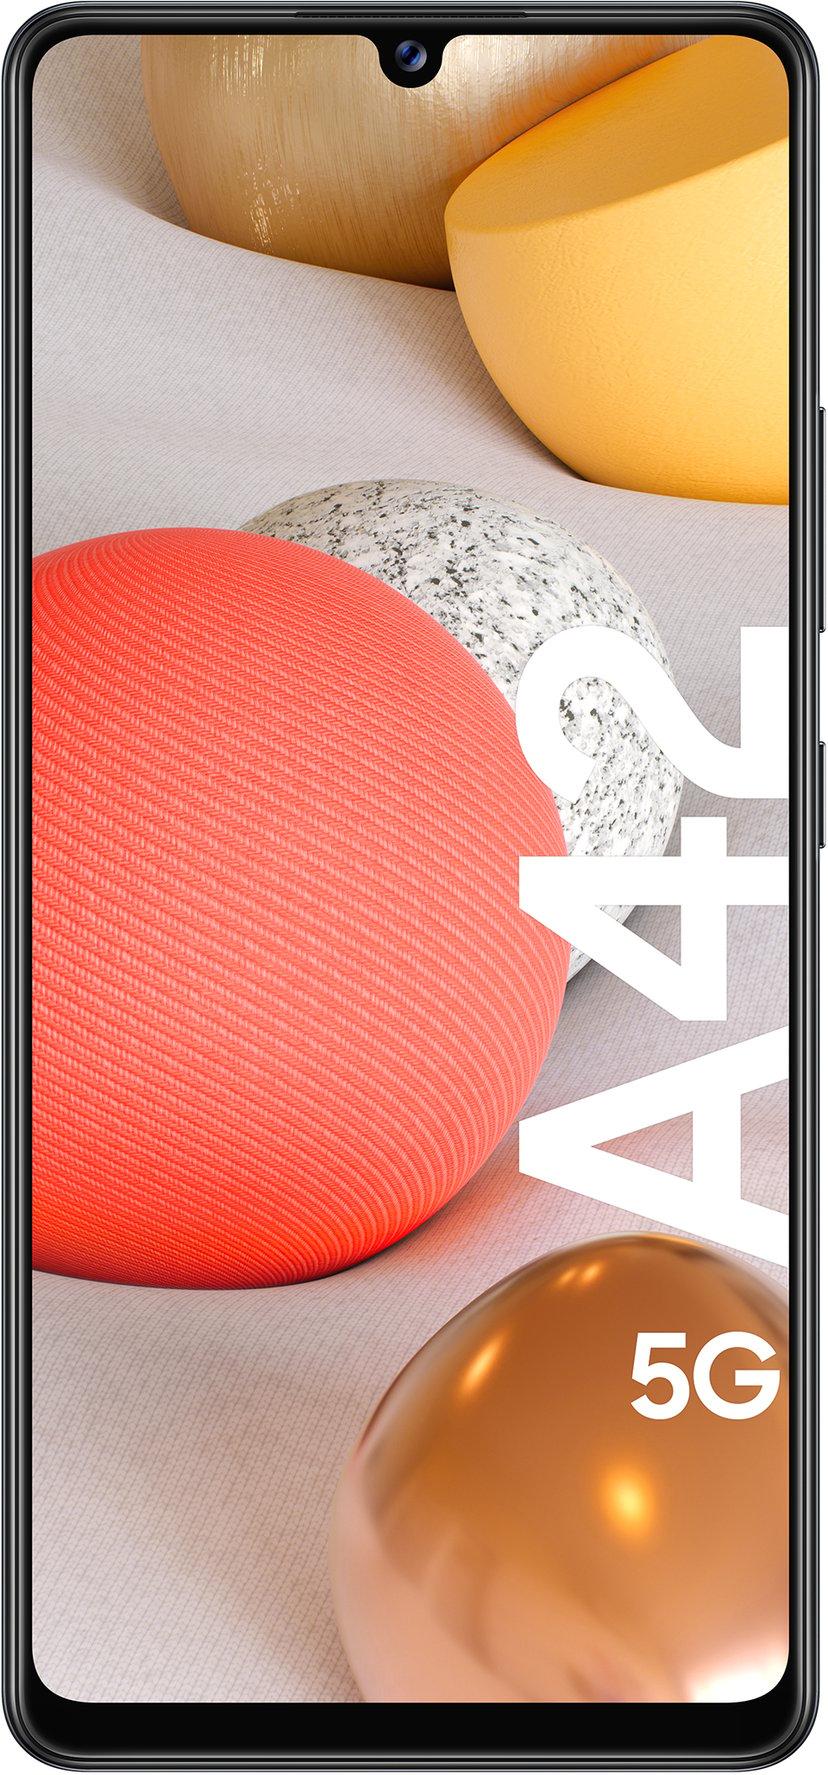 Samsung Galaxy A42 5G 128GB Dual-SIM Prisma med prickig svart